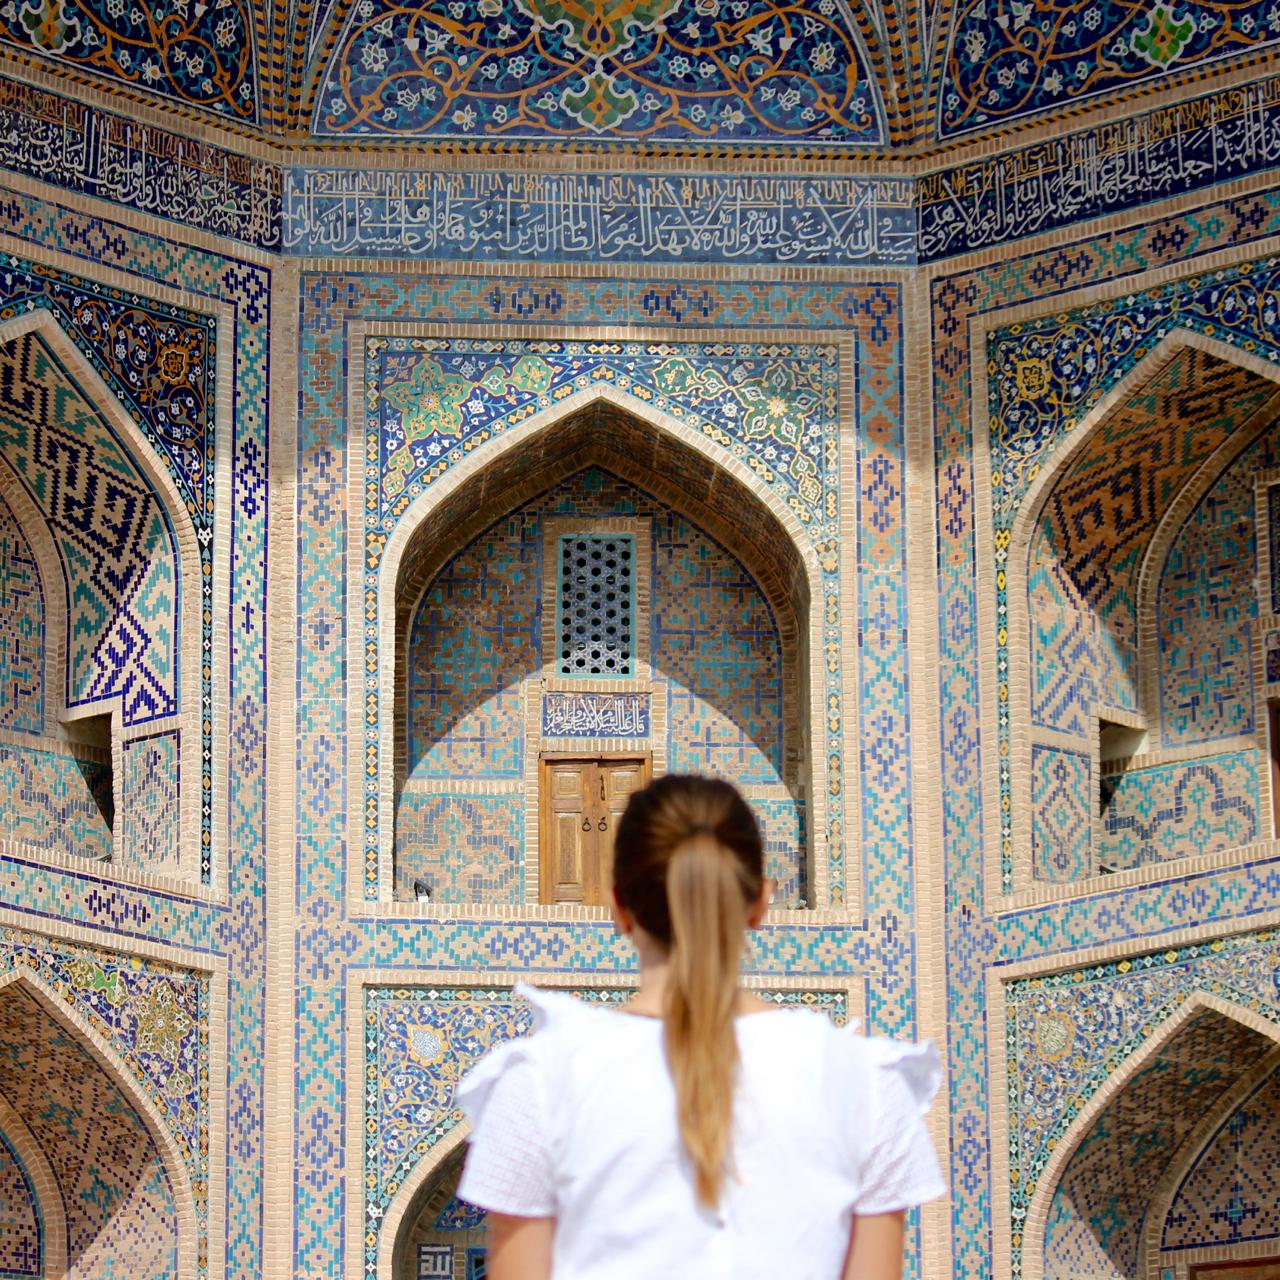 samarkand, uzbekistan - 9